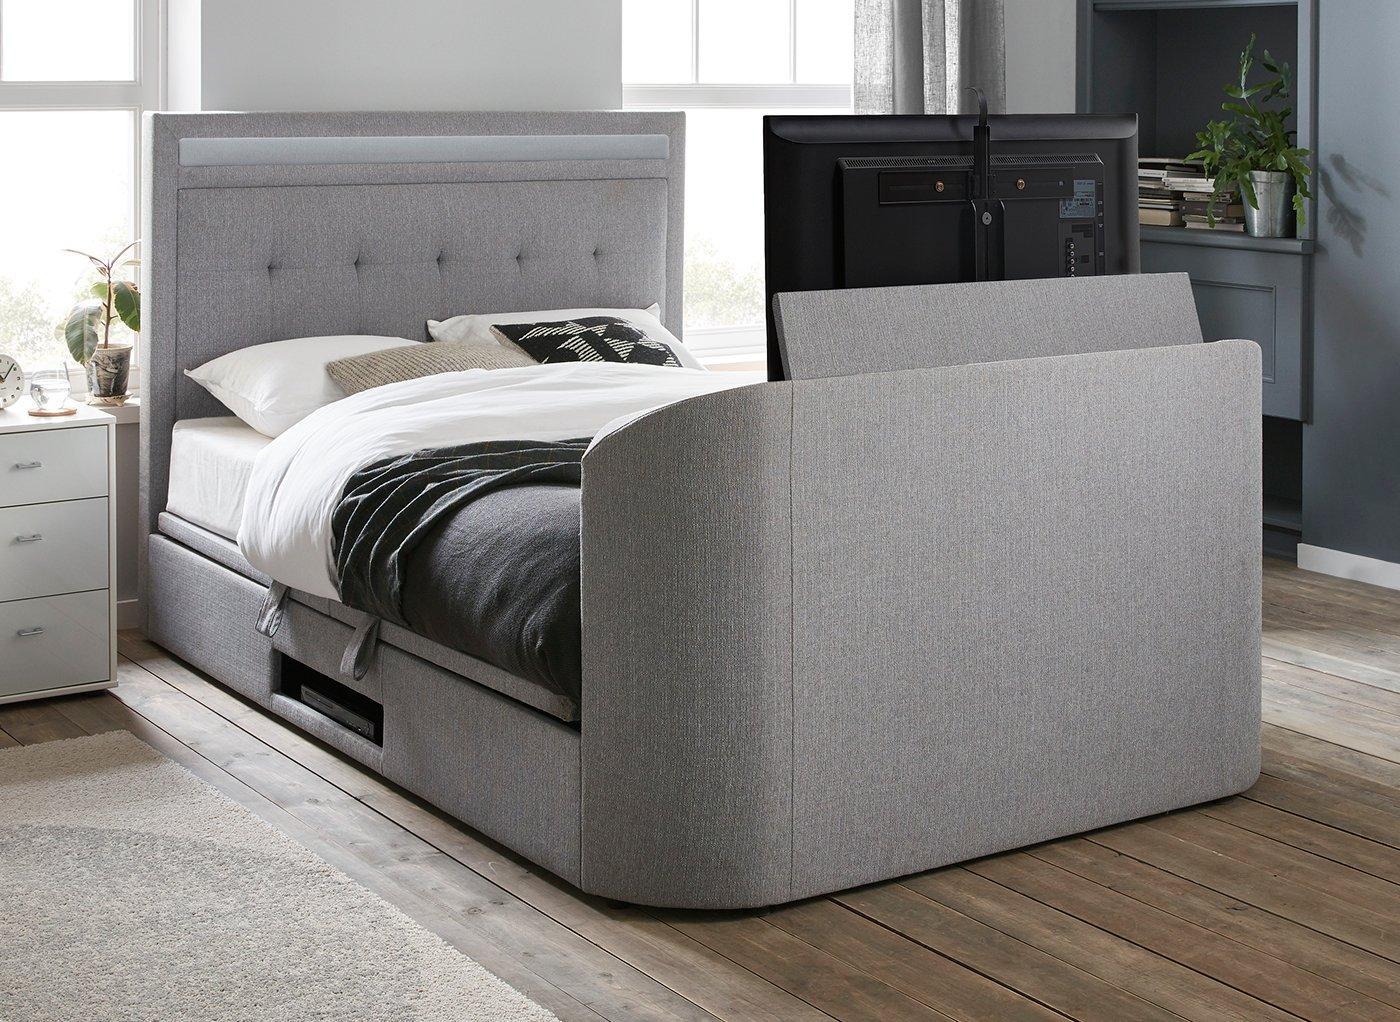 Tokyo D TV/Media Bed Grey Fabric SMART TV 4'6 Double